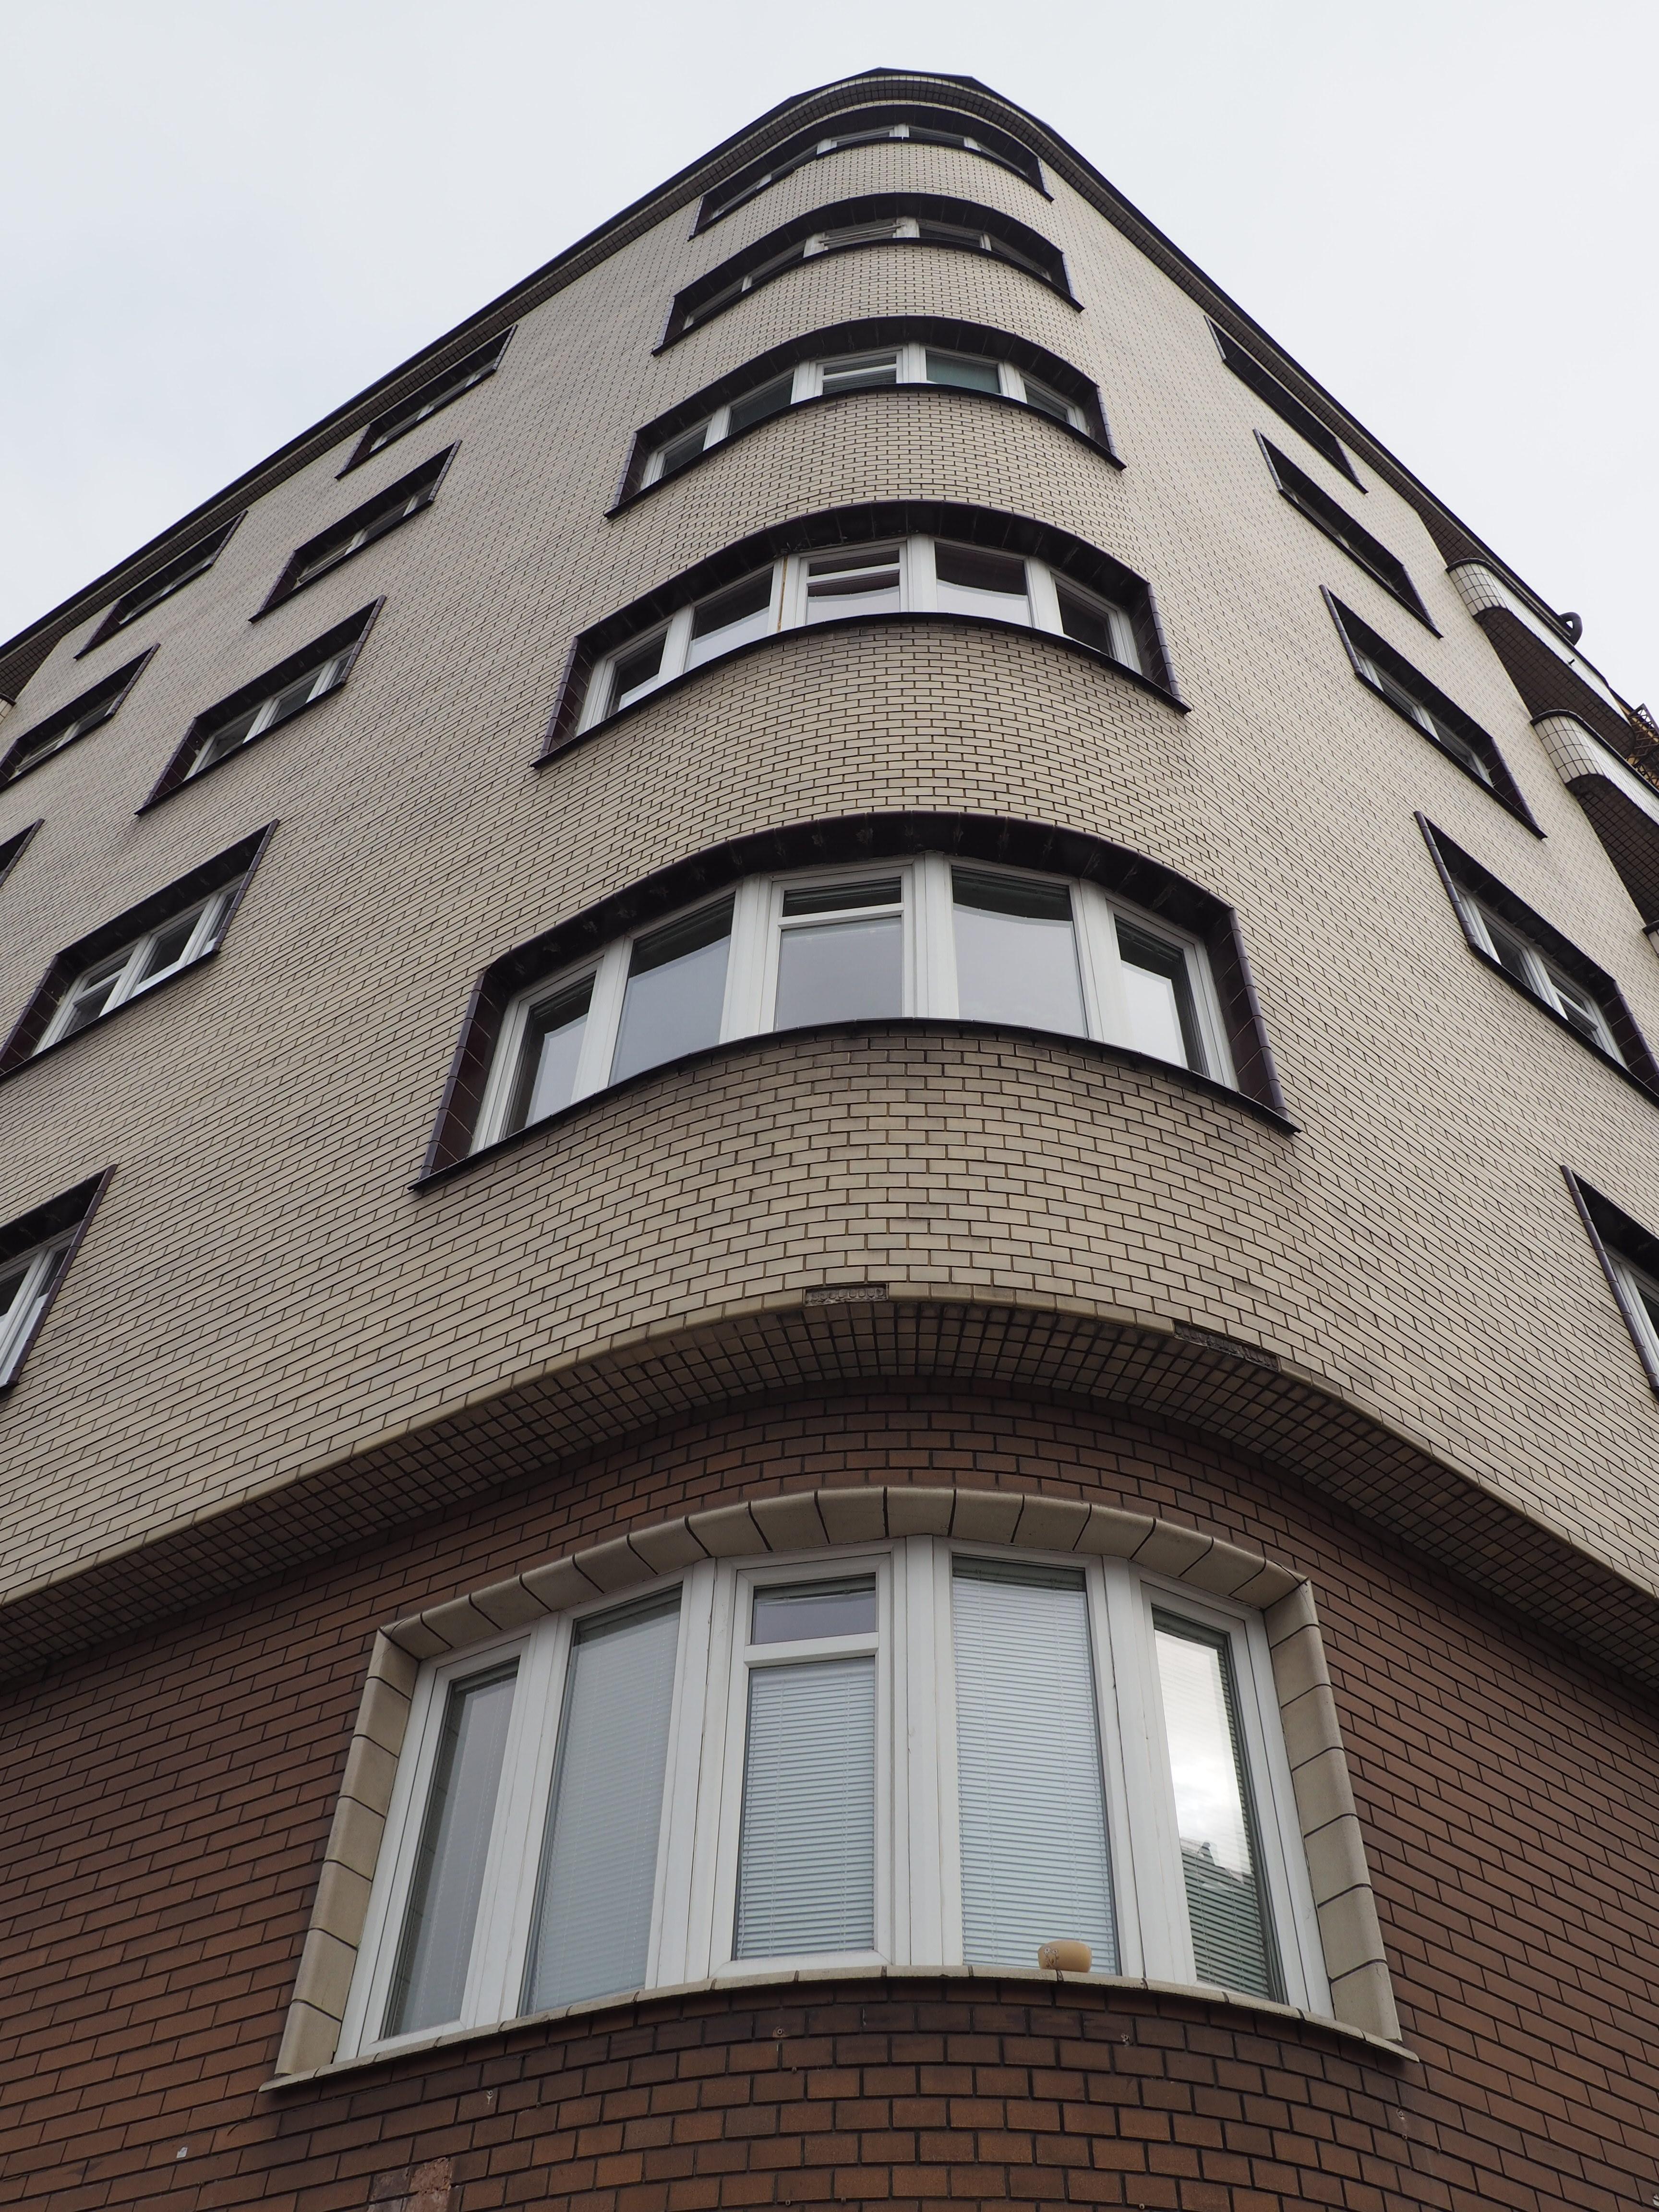 Fotos gratis : arquitectura, estructura, ventana, techo, edificio ...